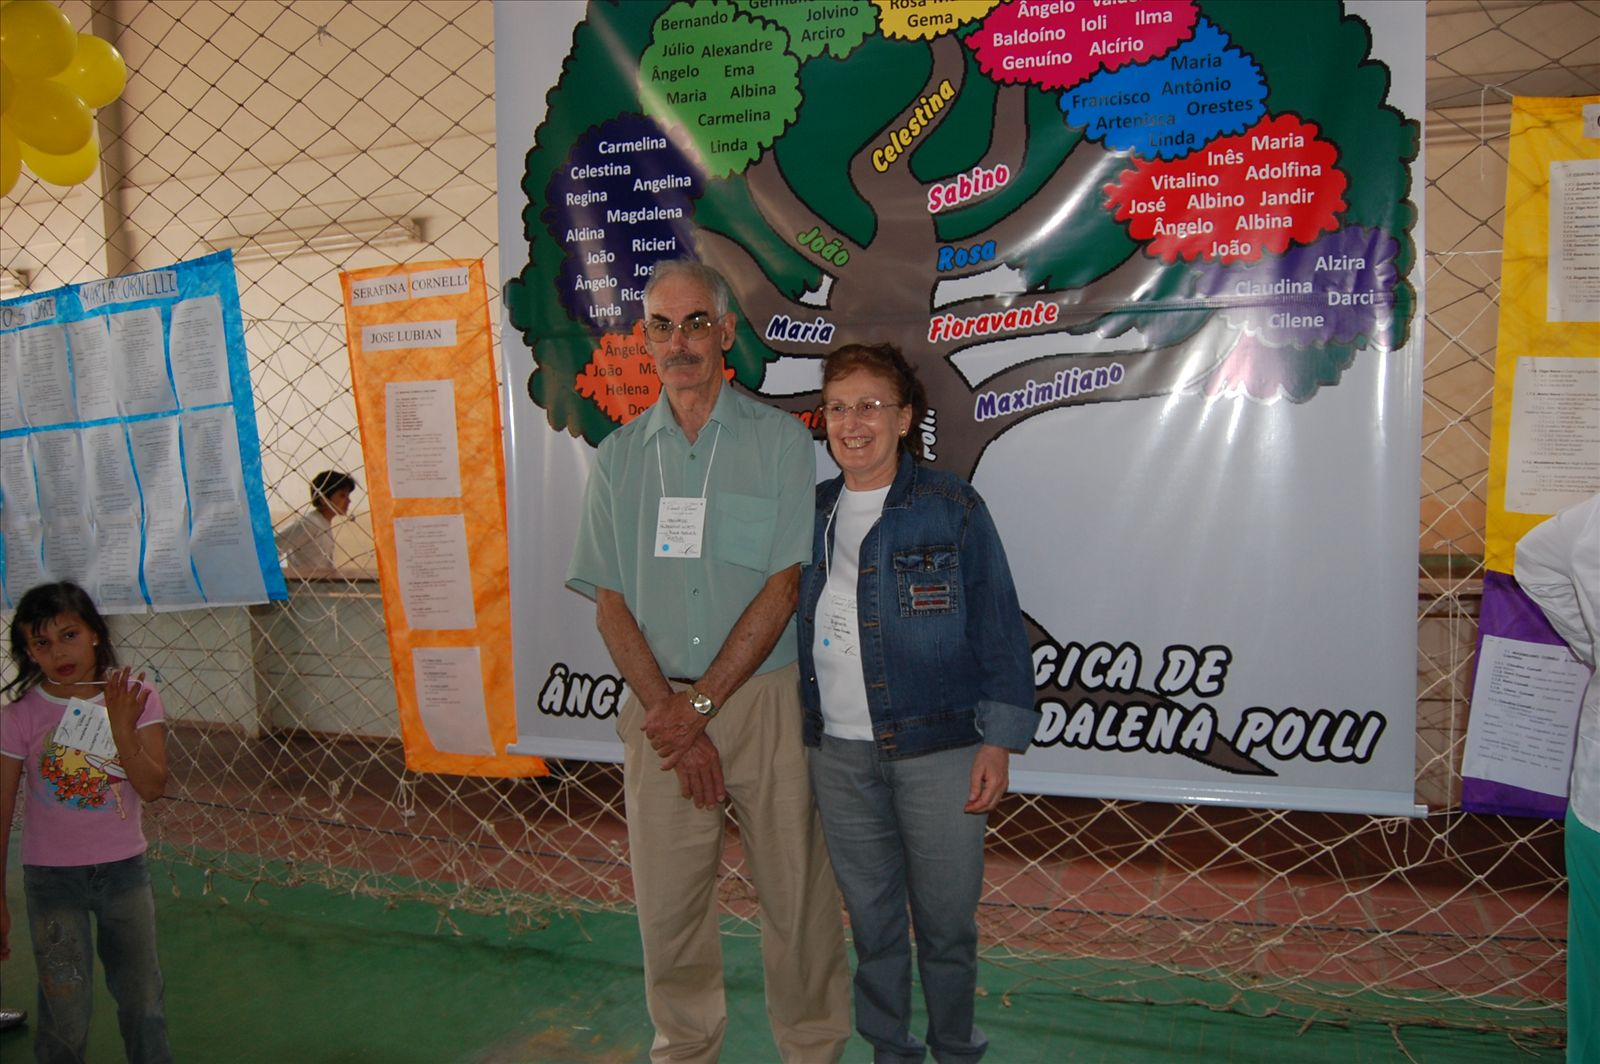 2º Encontro Família Cornelli - 11.10.2009 (72)_0